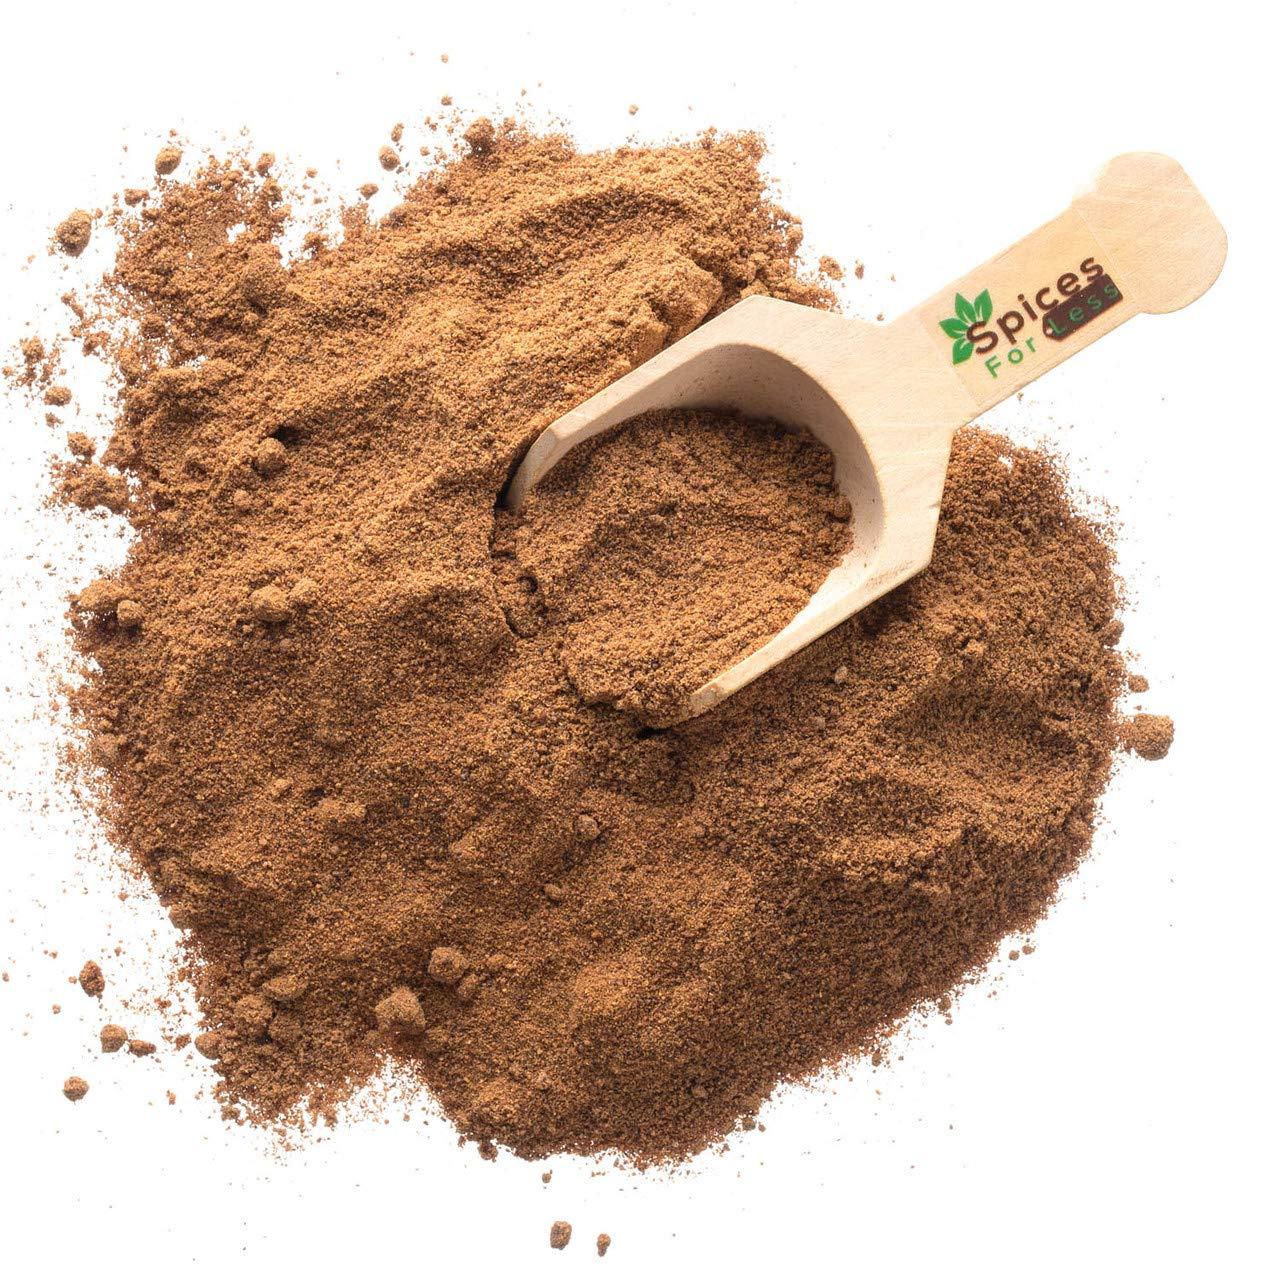 Nutmeg, Ground - 5 lbs Bulk